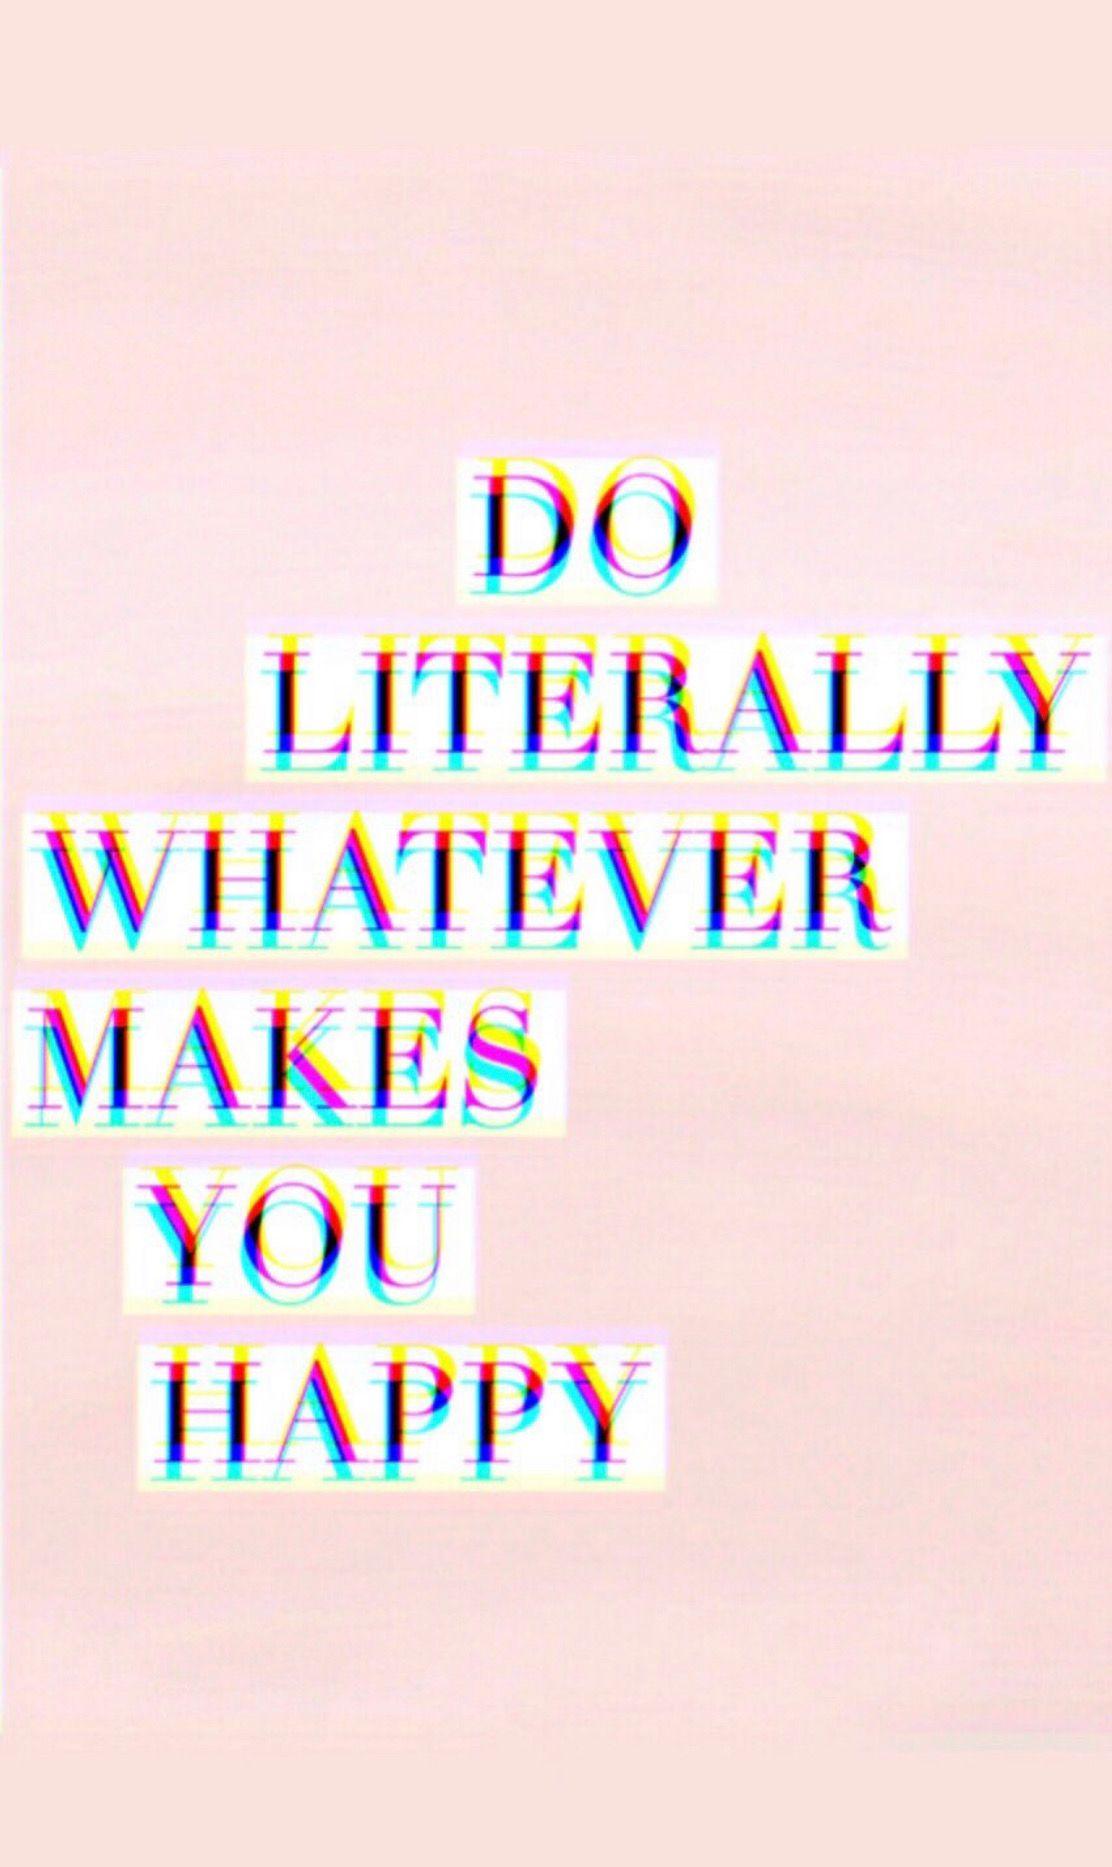 Pinterest Madisontate Motivational Words Wallpaper